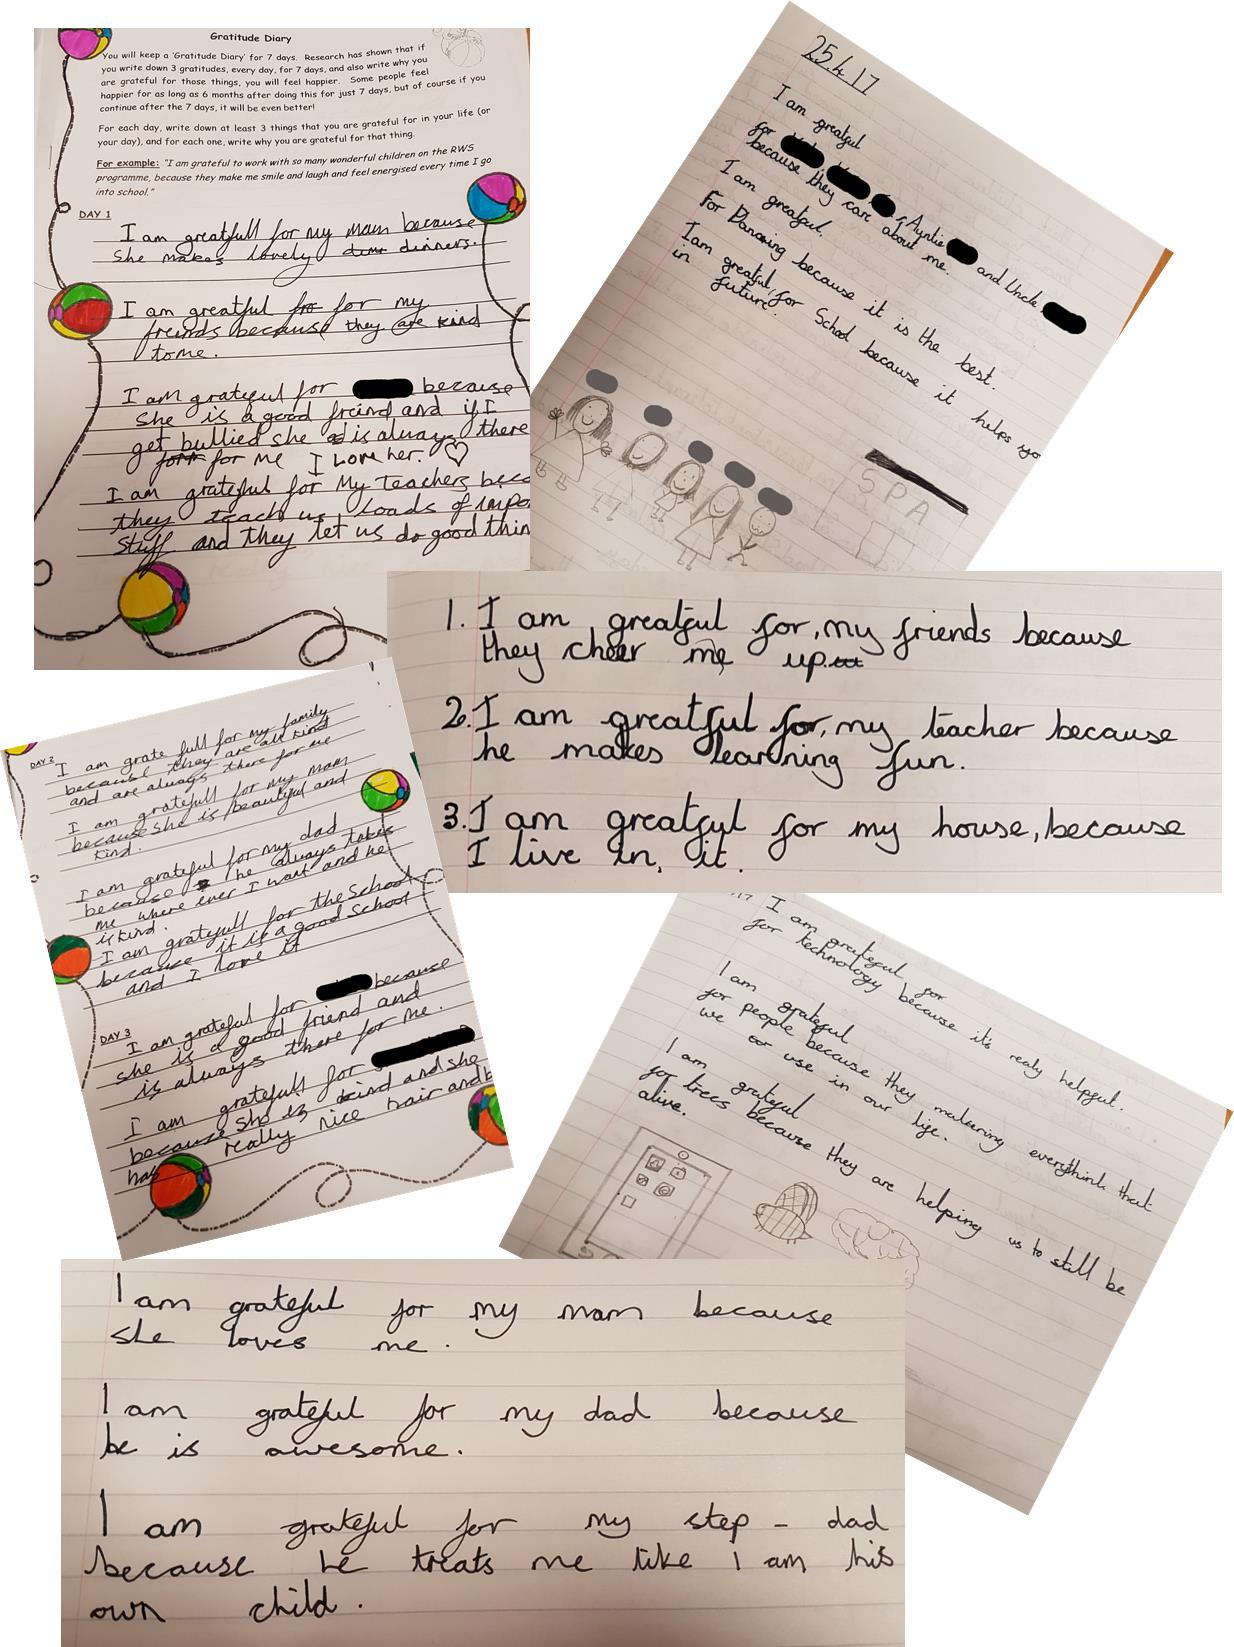 Gratitude Diary Entry Examples